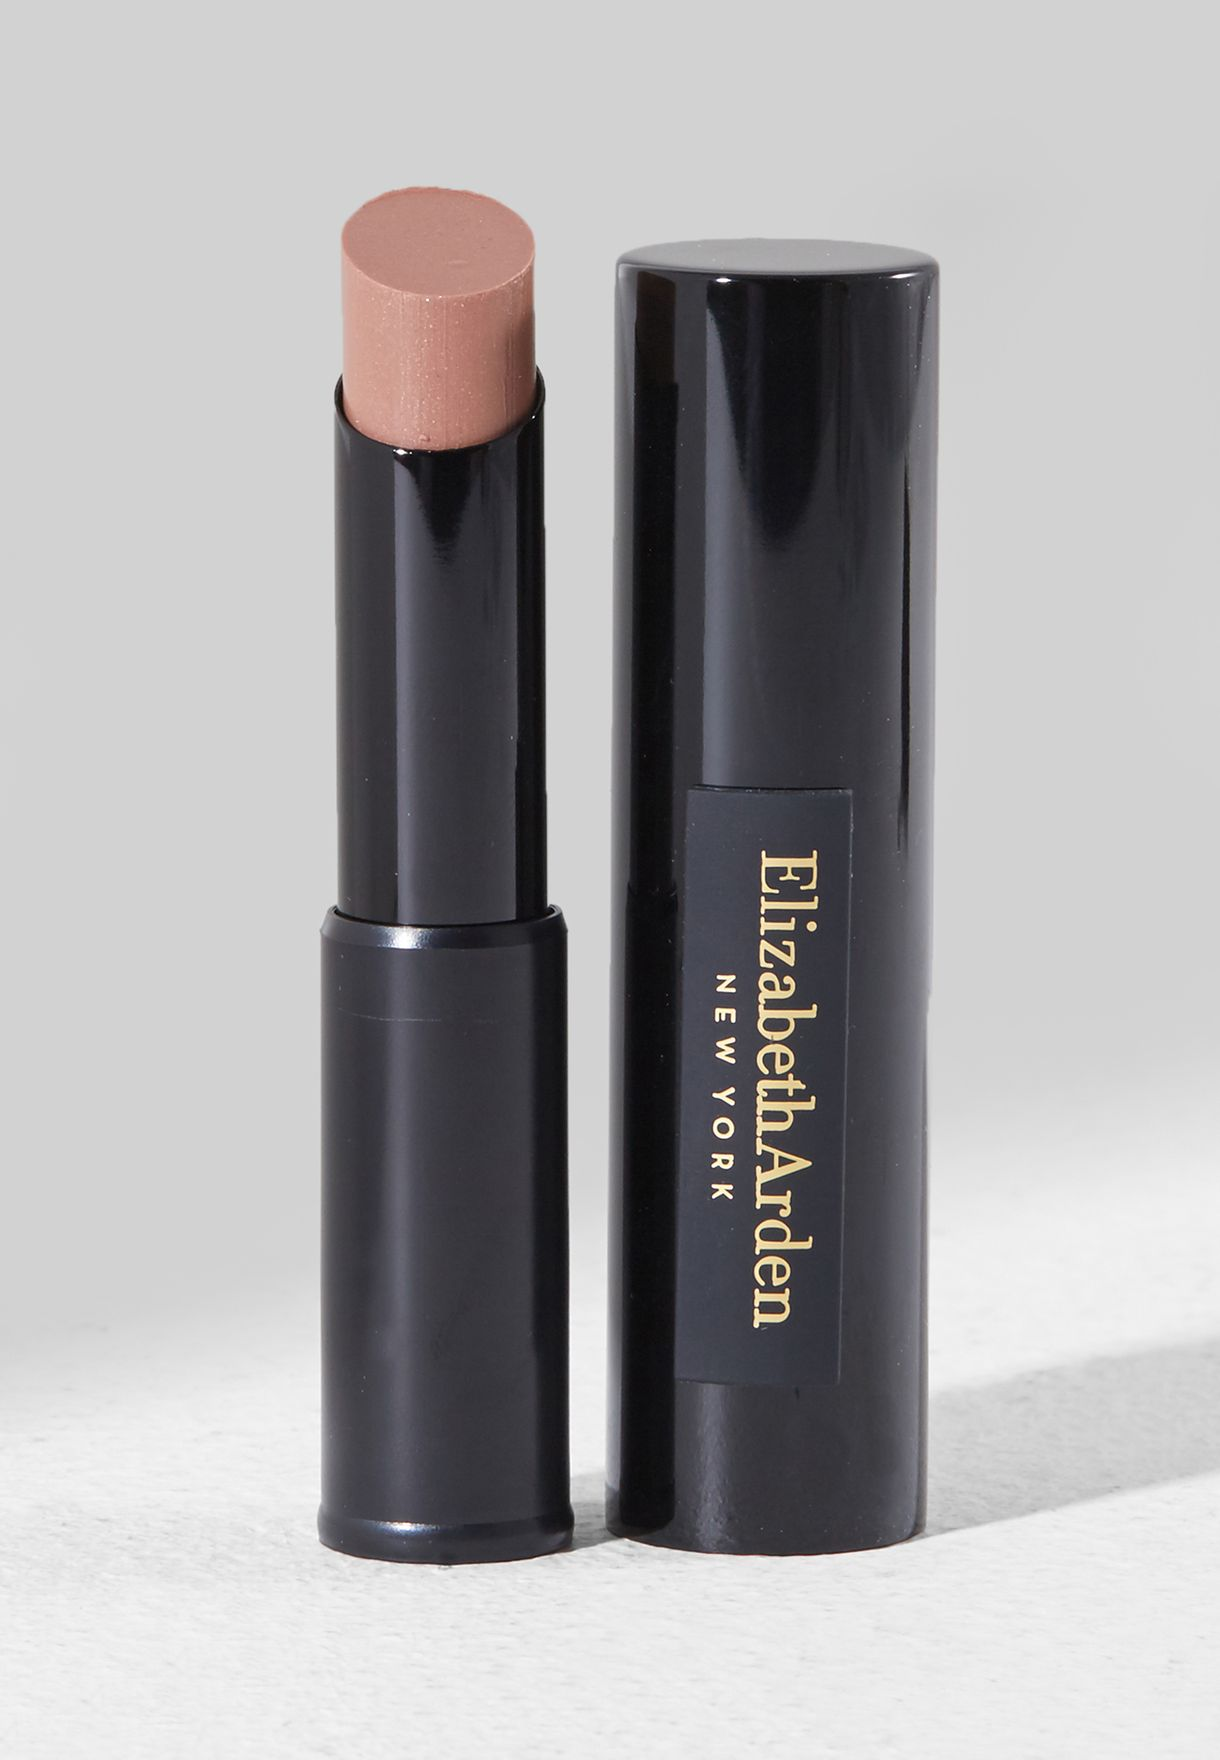 Gelato Plush Up Lipstick - Nude Fizz